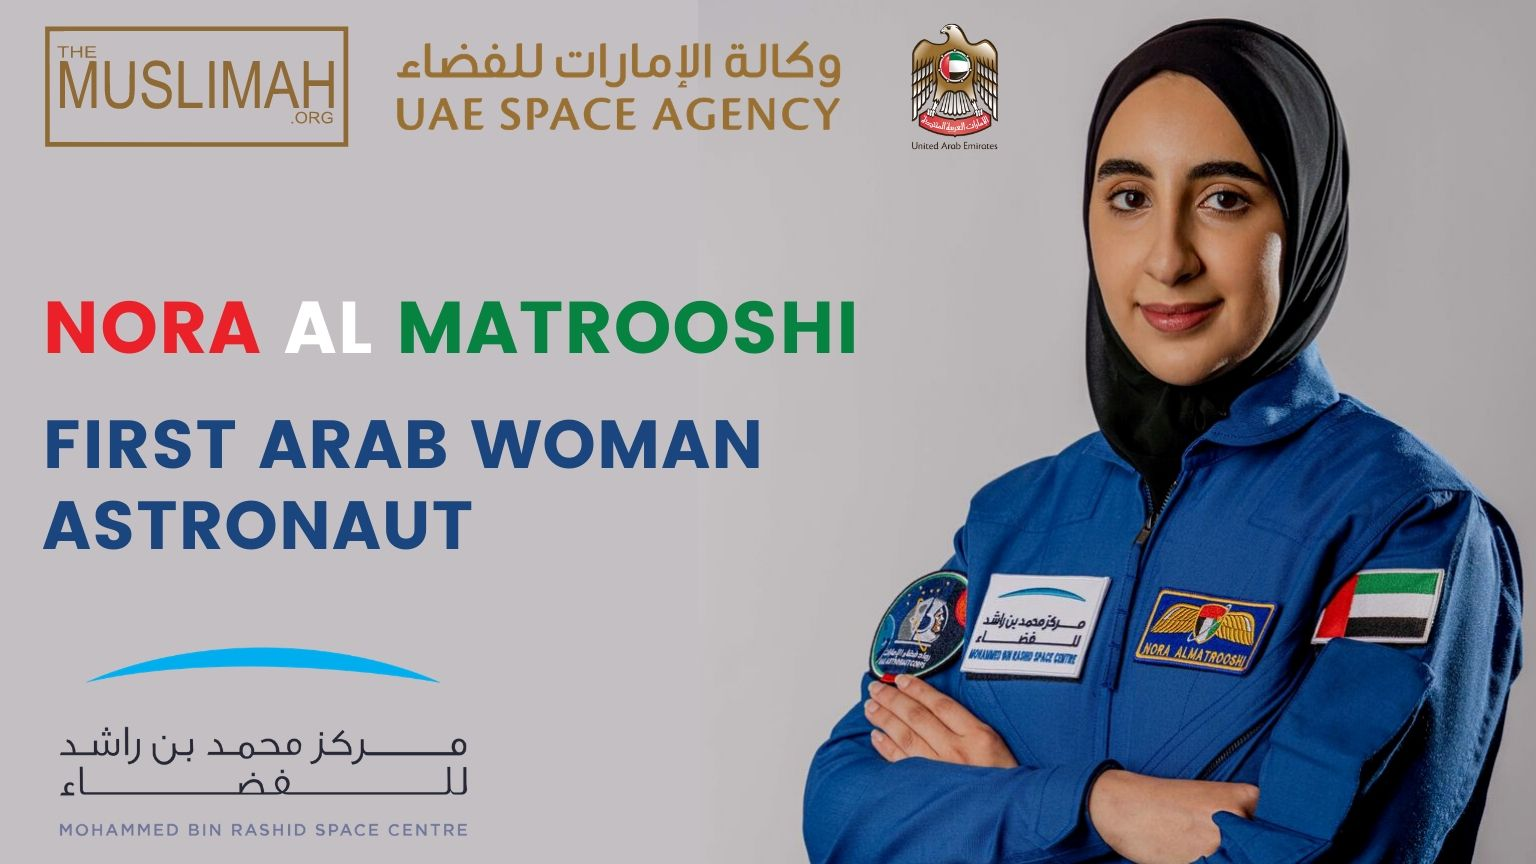 🇦🇪 Nora Al Matrooshi 🧕 | First Arab Woman Astronaut 👩🚀